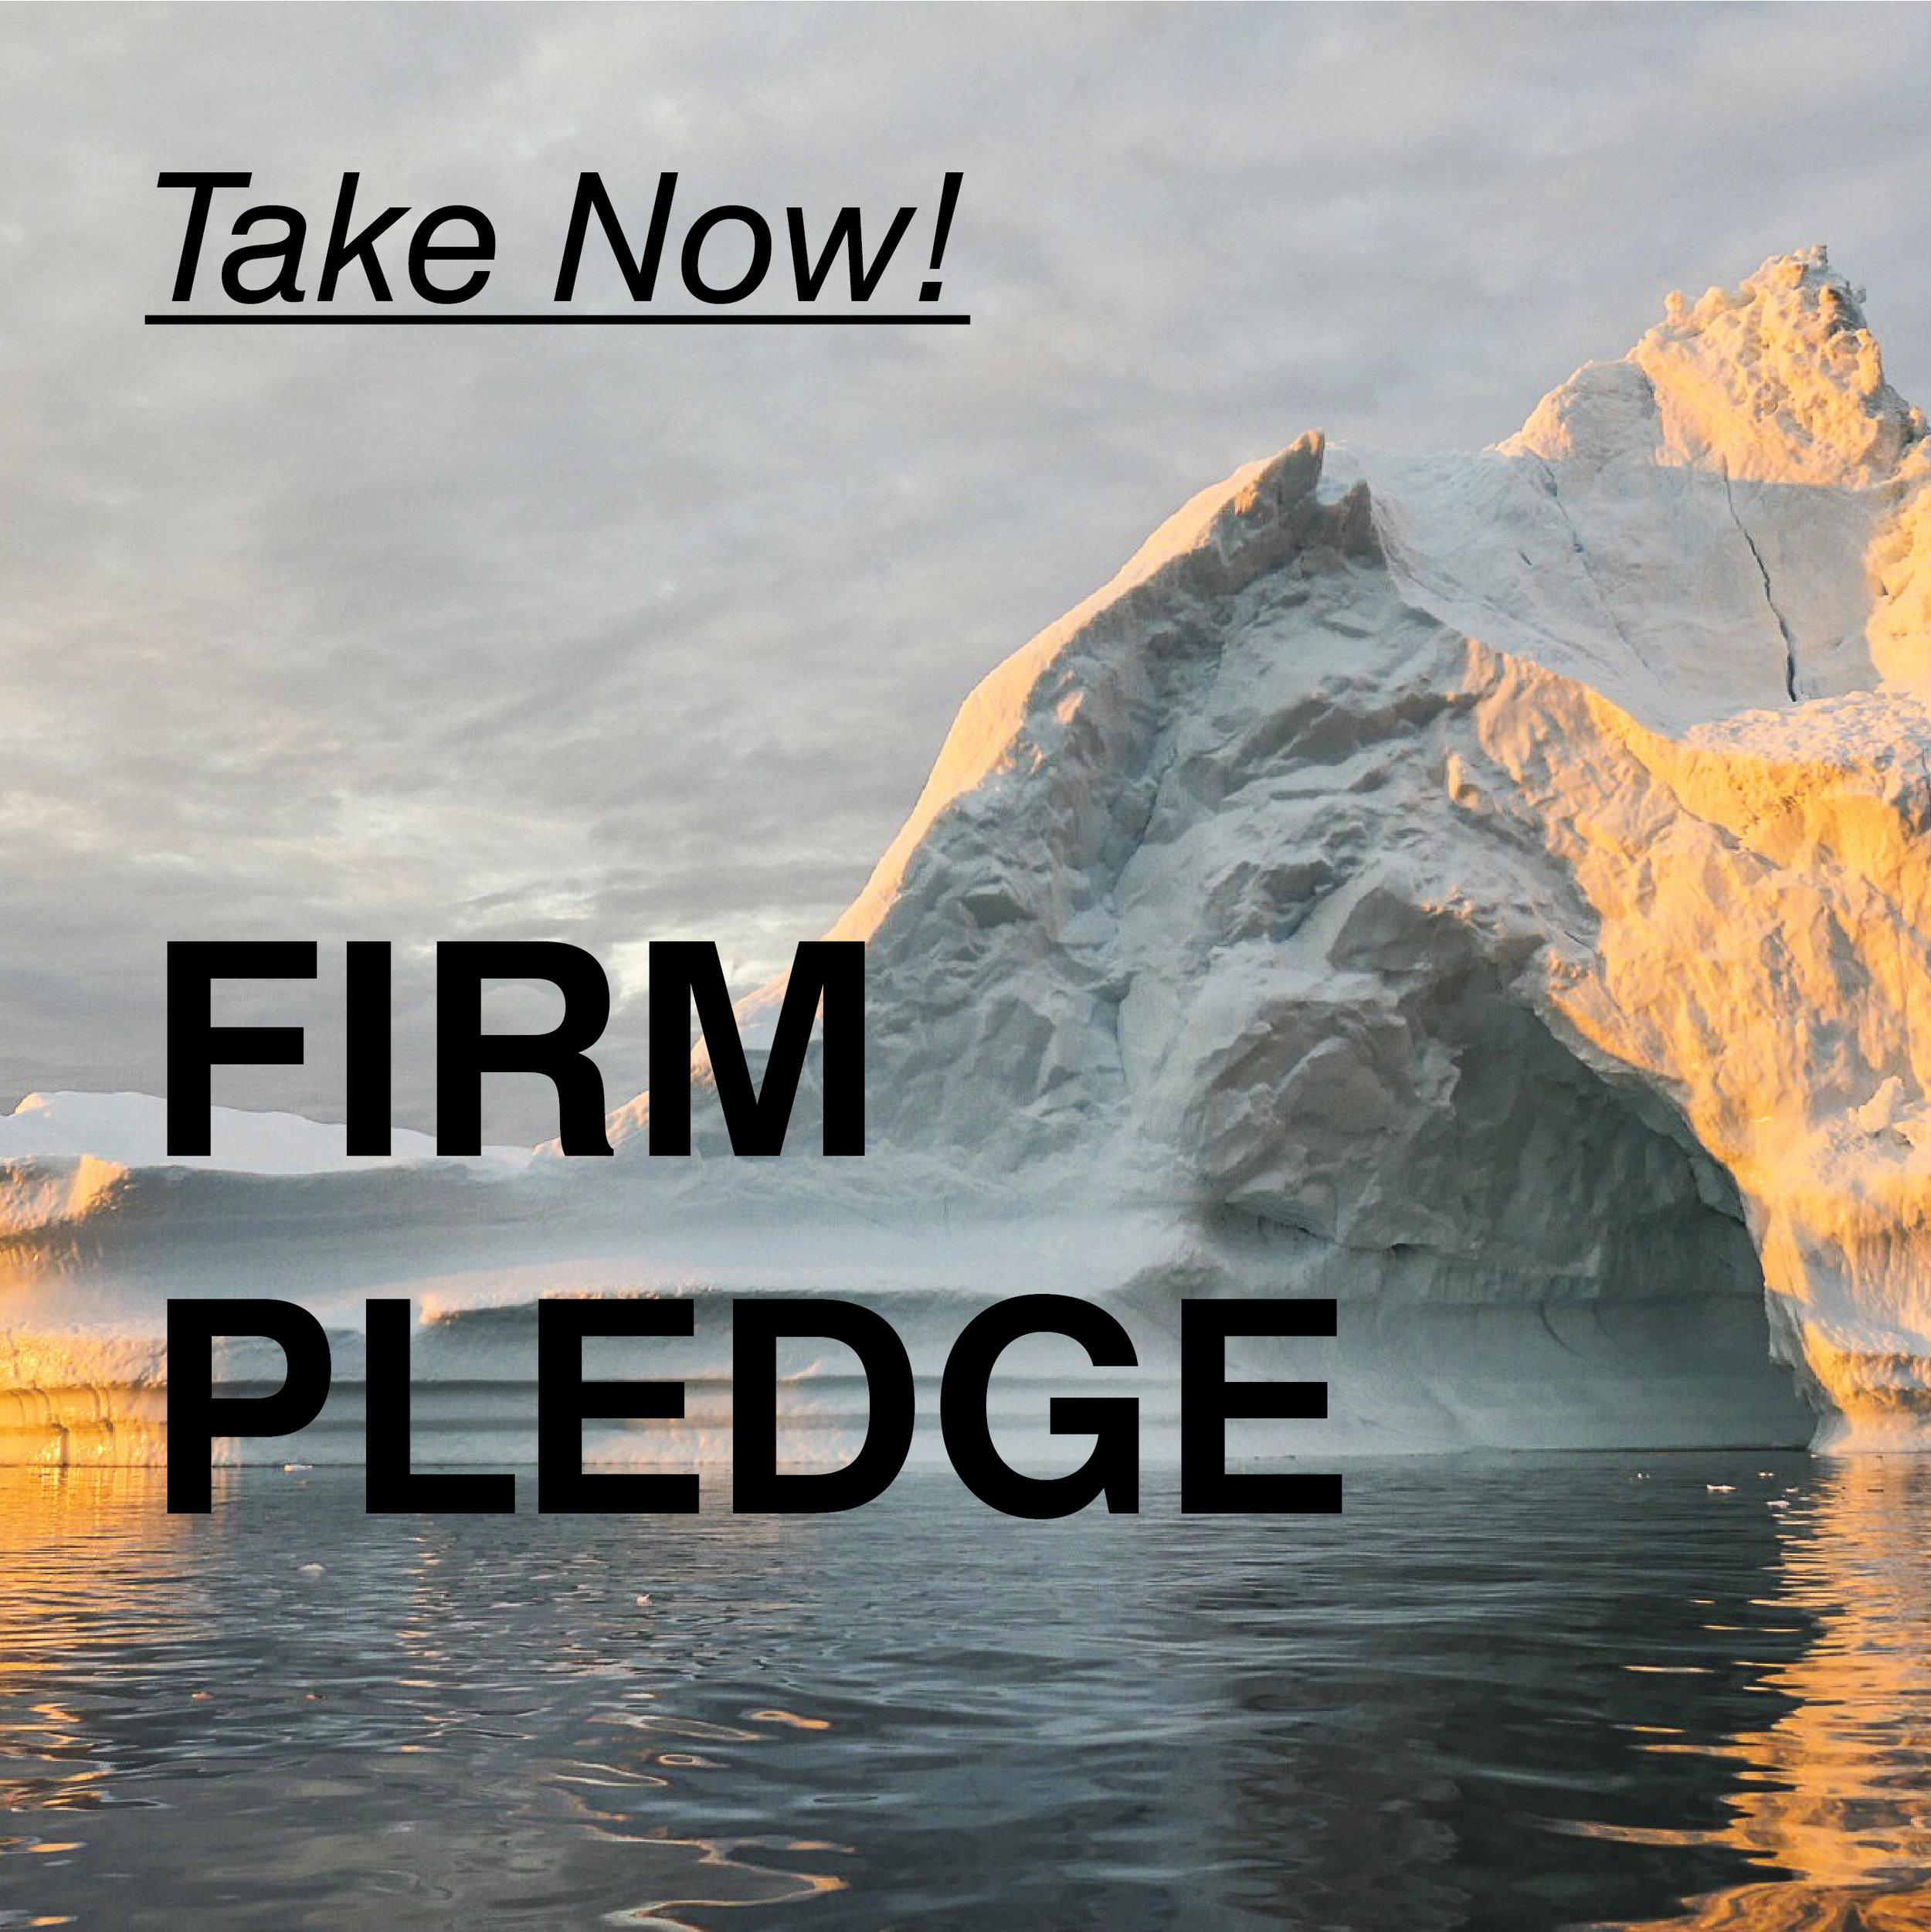 Pledge-02.jpg